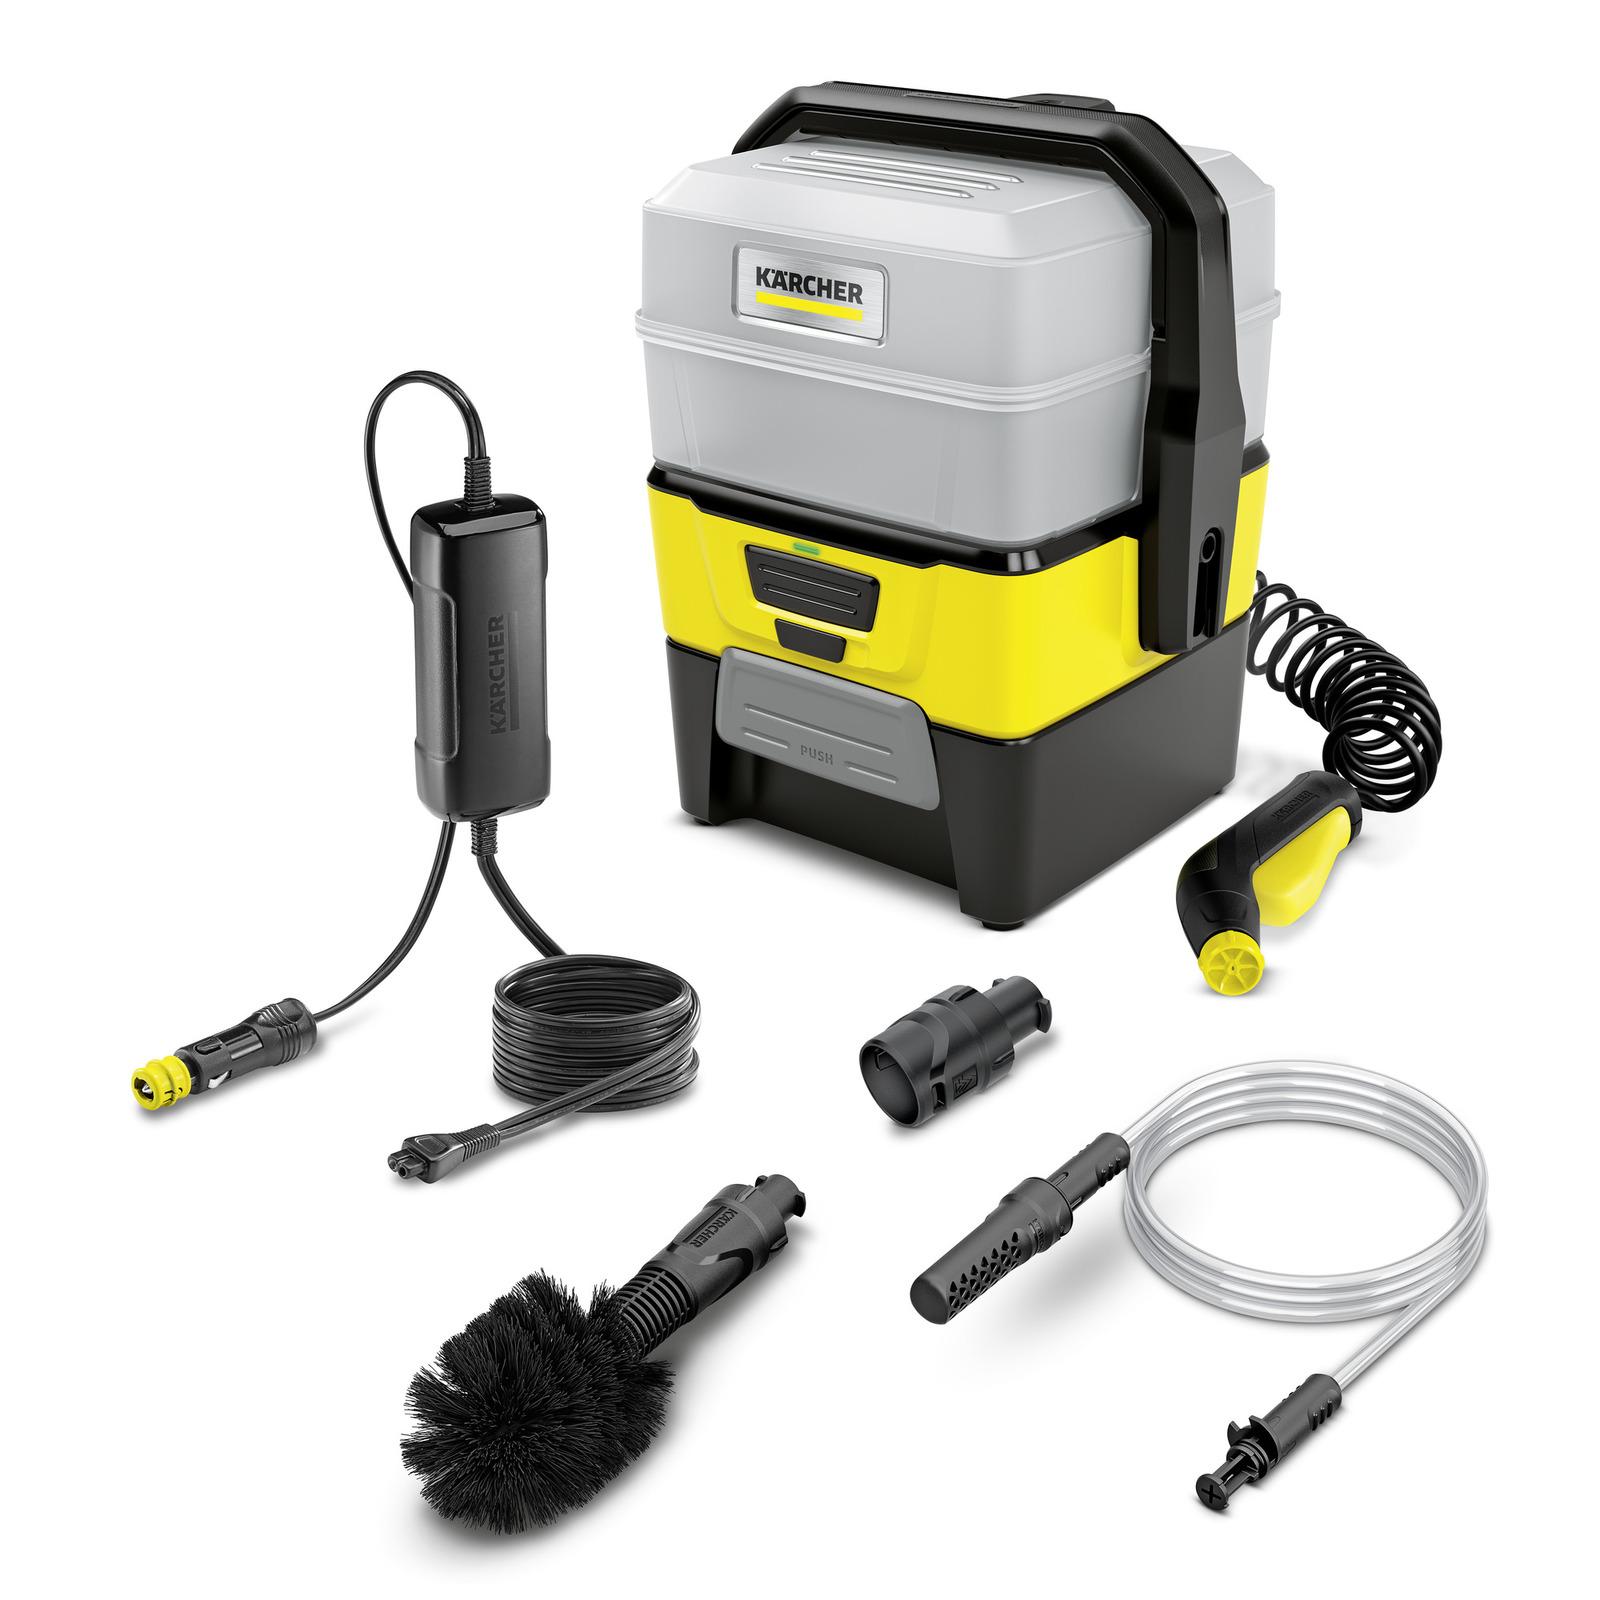 KARCHER 1.680-038.0 - OC3 Plus Multi-Purpose Box Mobile Outdoor Cleaner